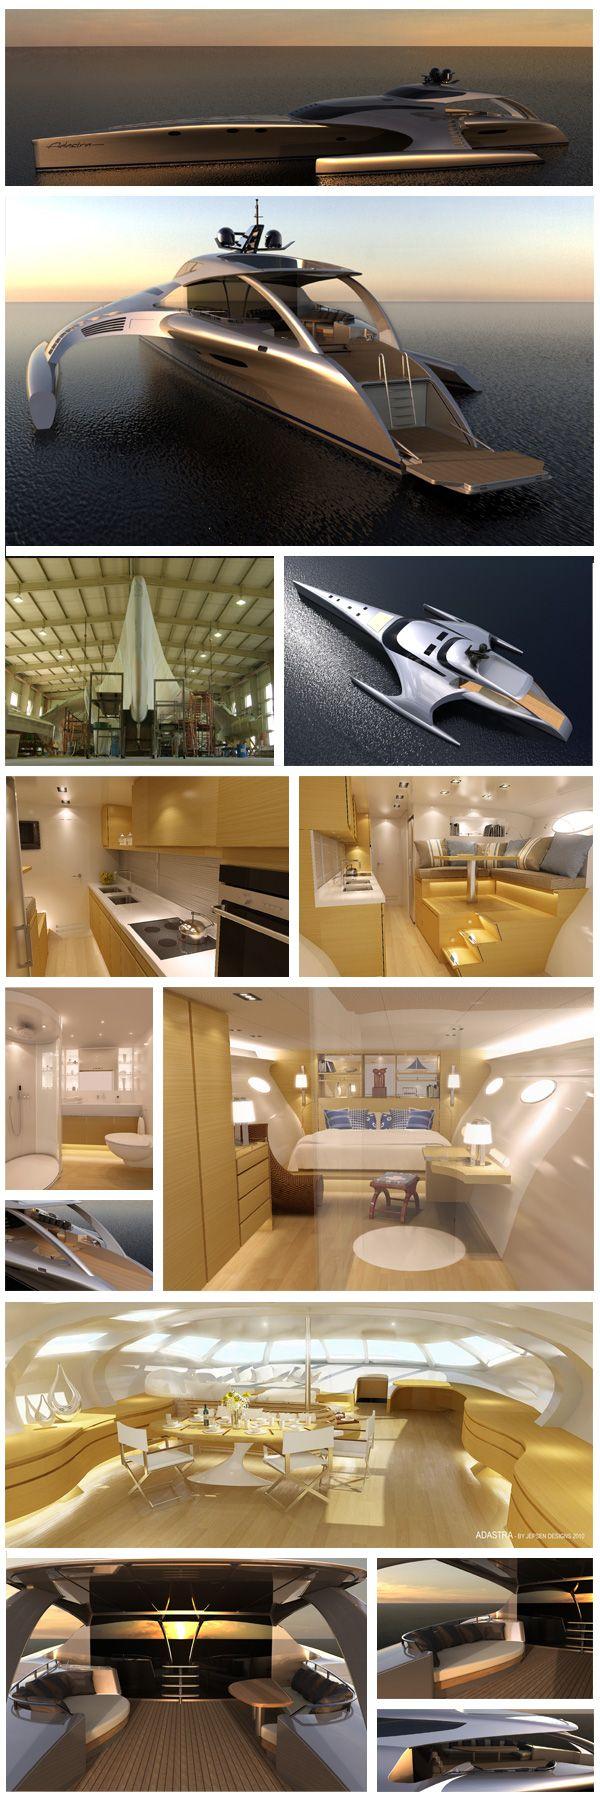 luxury yachts | luxury lifestyle | luxury living